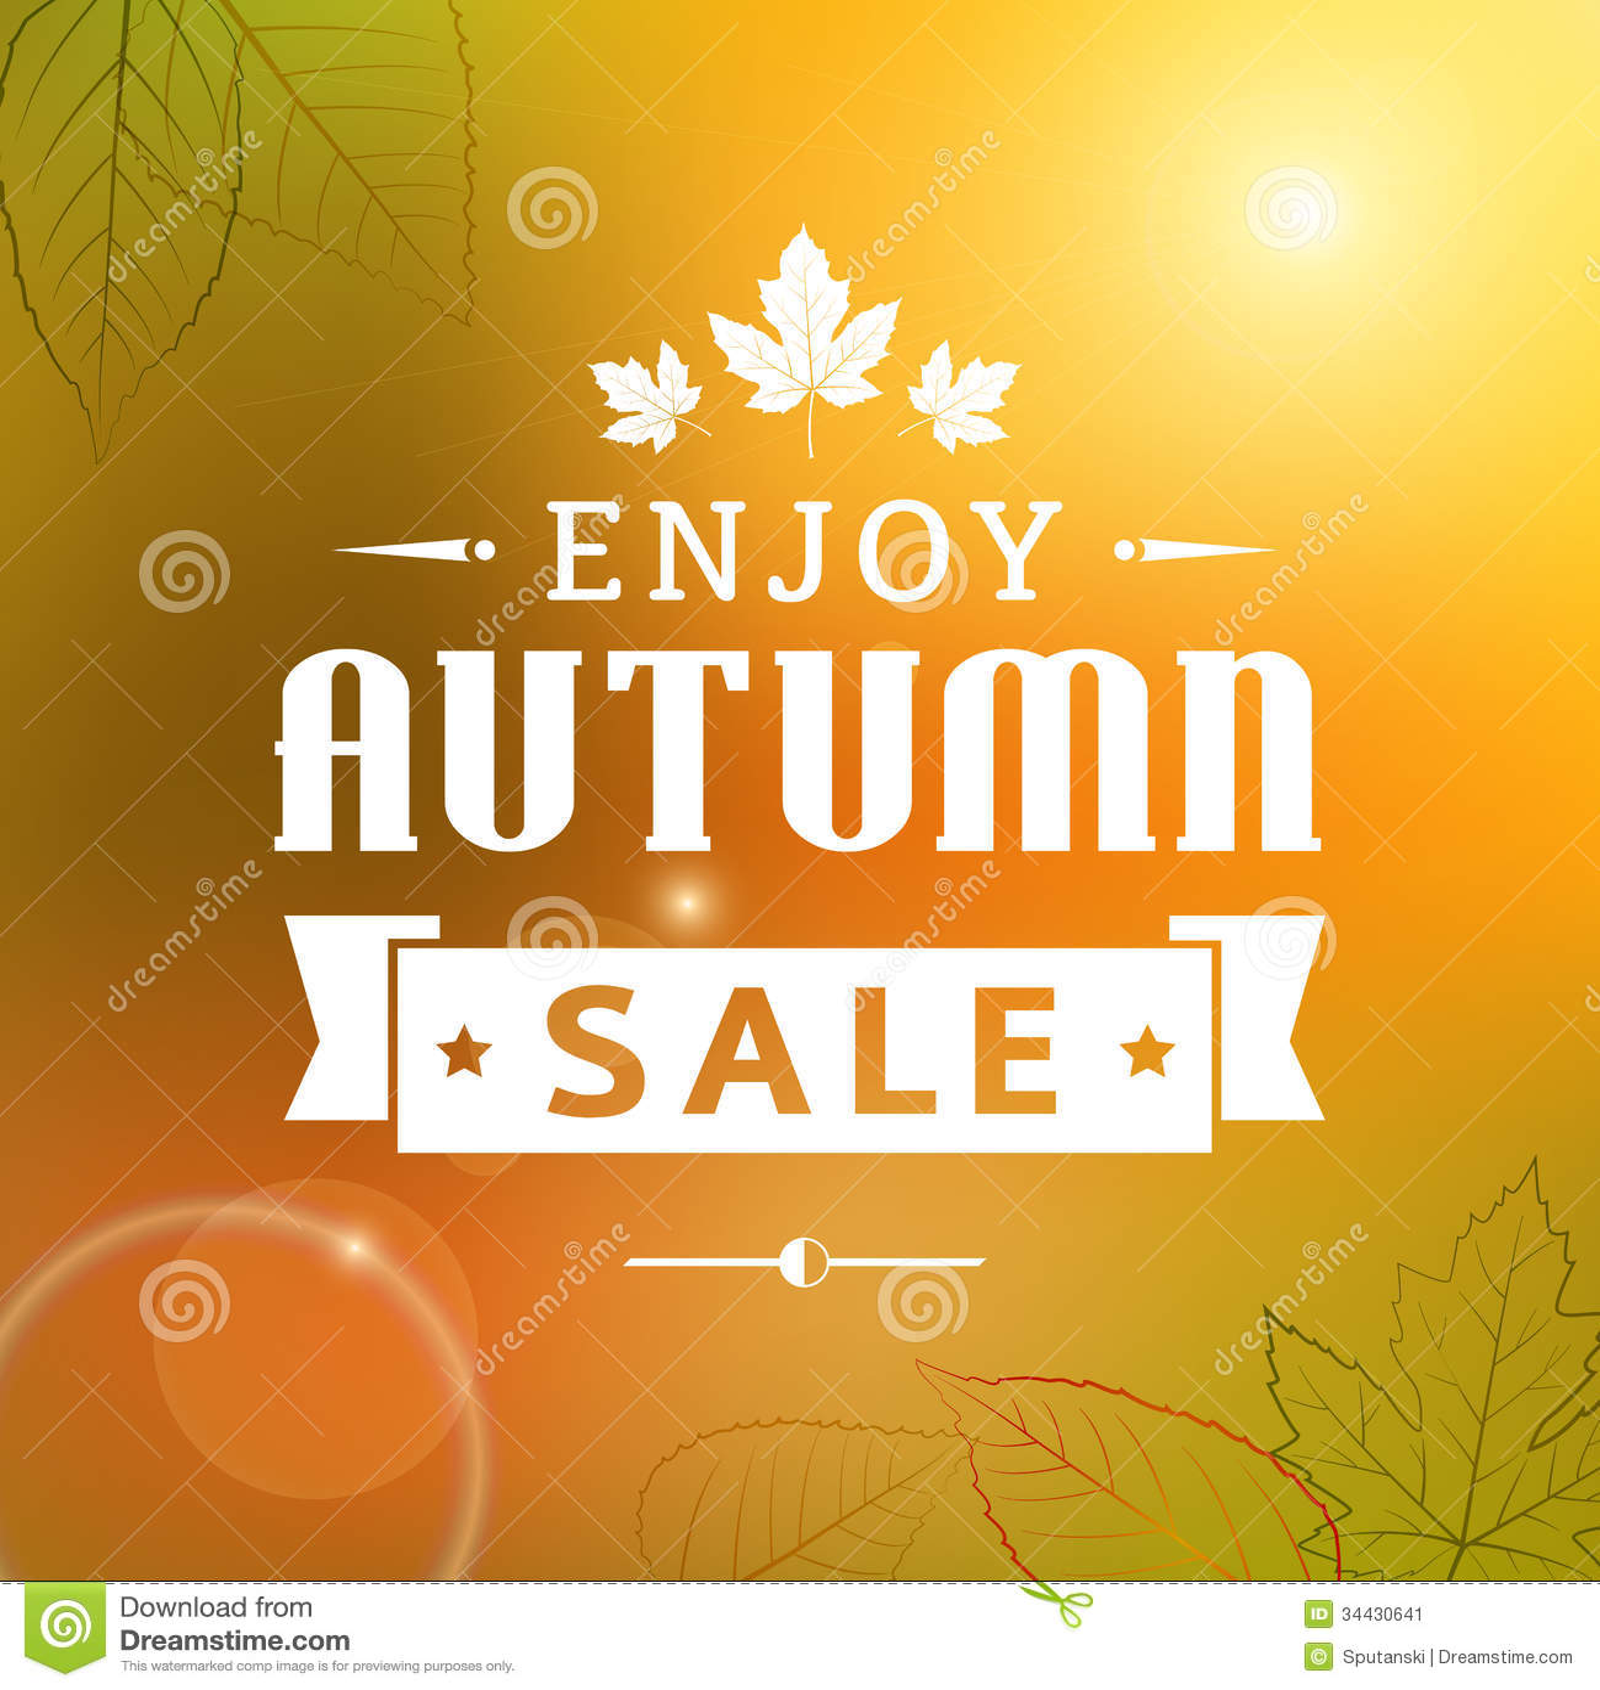 Enjoy Autumn Sale Vintage Typography Poster Stock Image